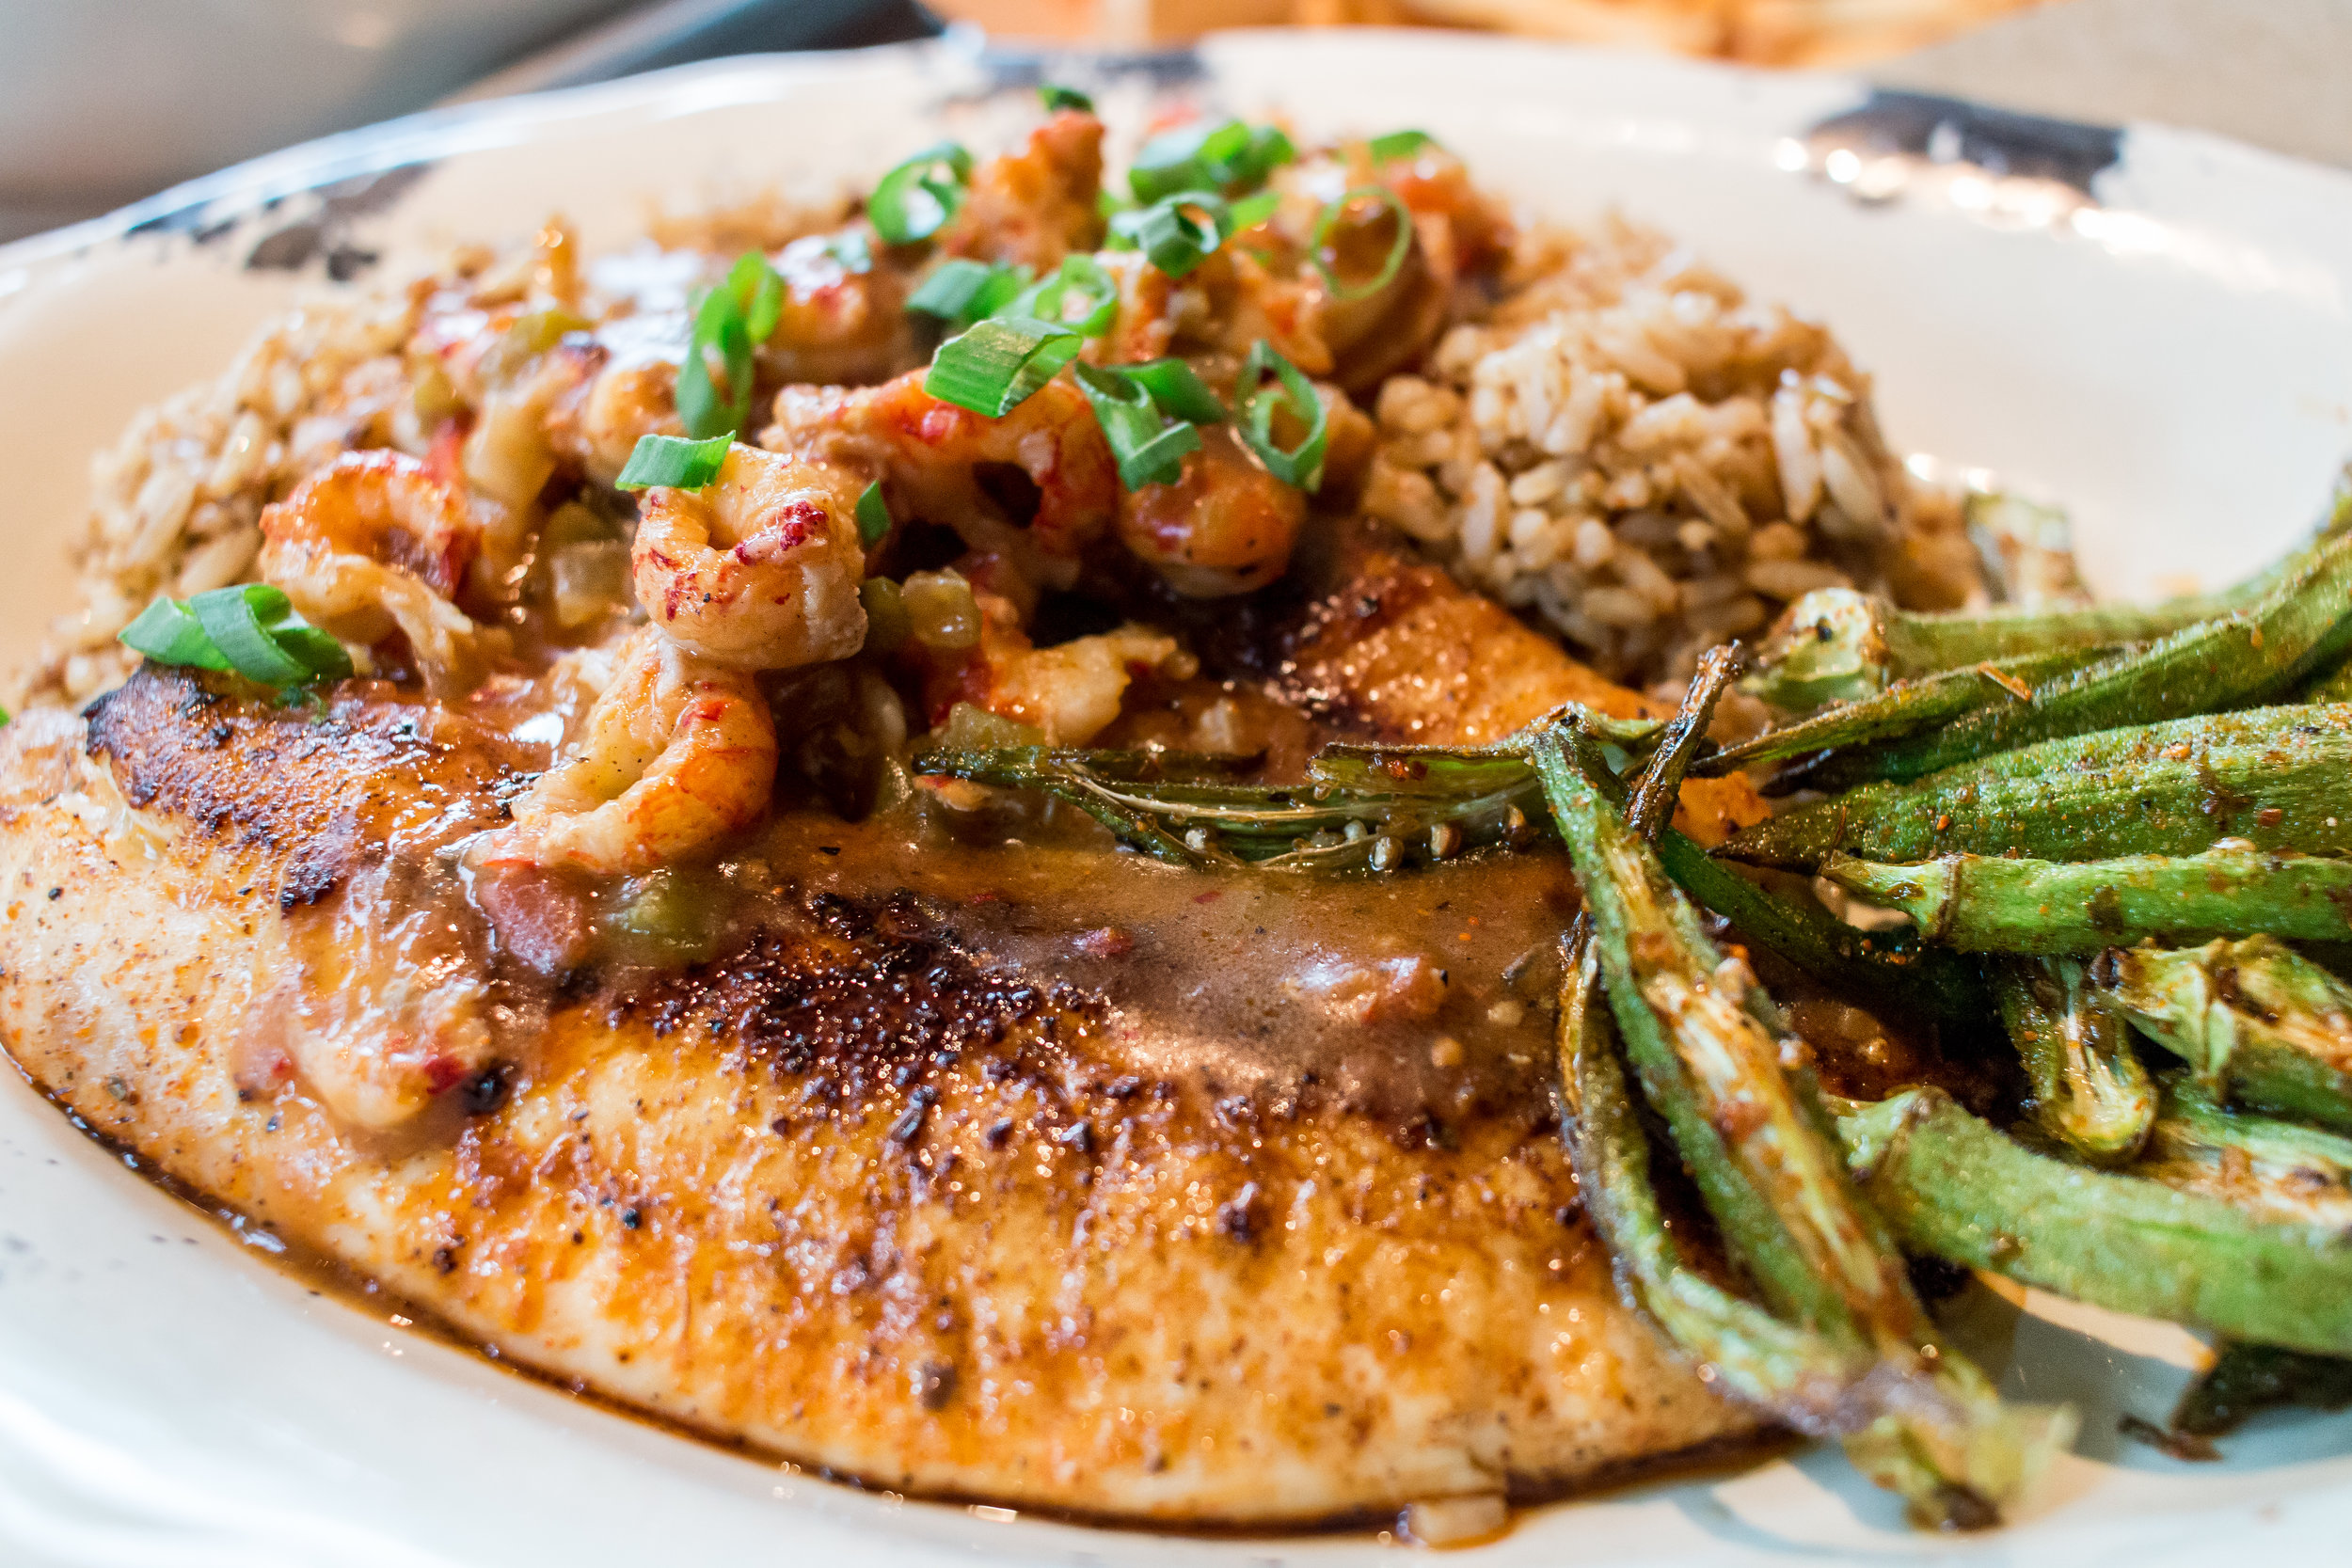 Tricky Fish- Blackened Tilapia, dirty rice, crawfish etouffee.